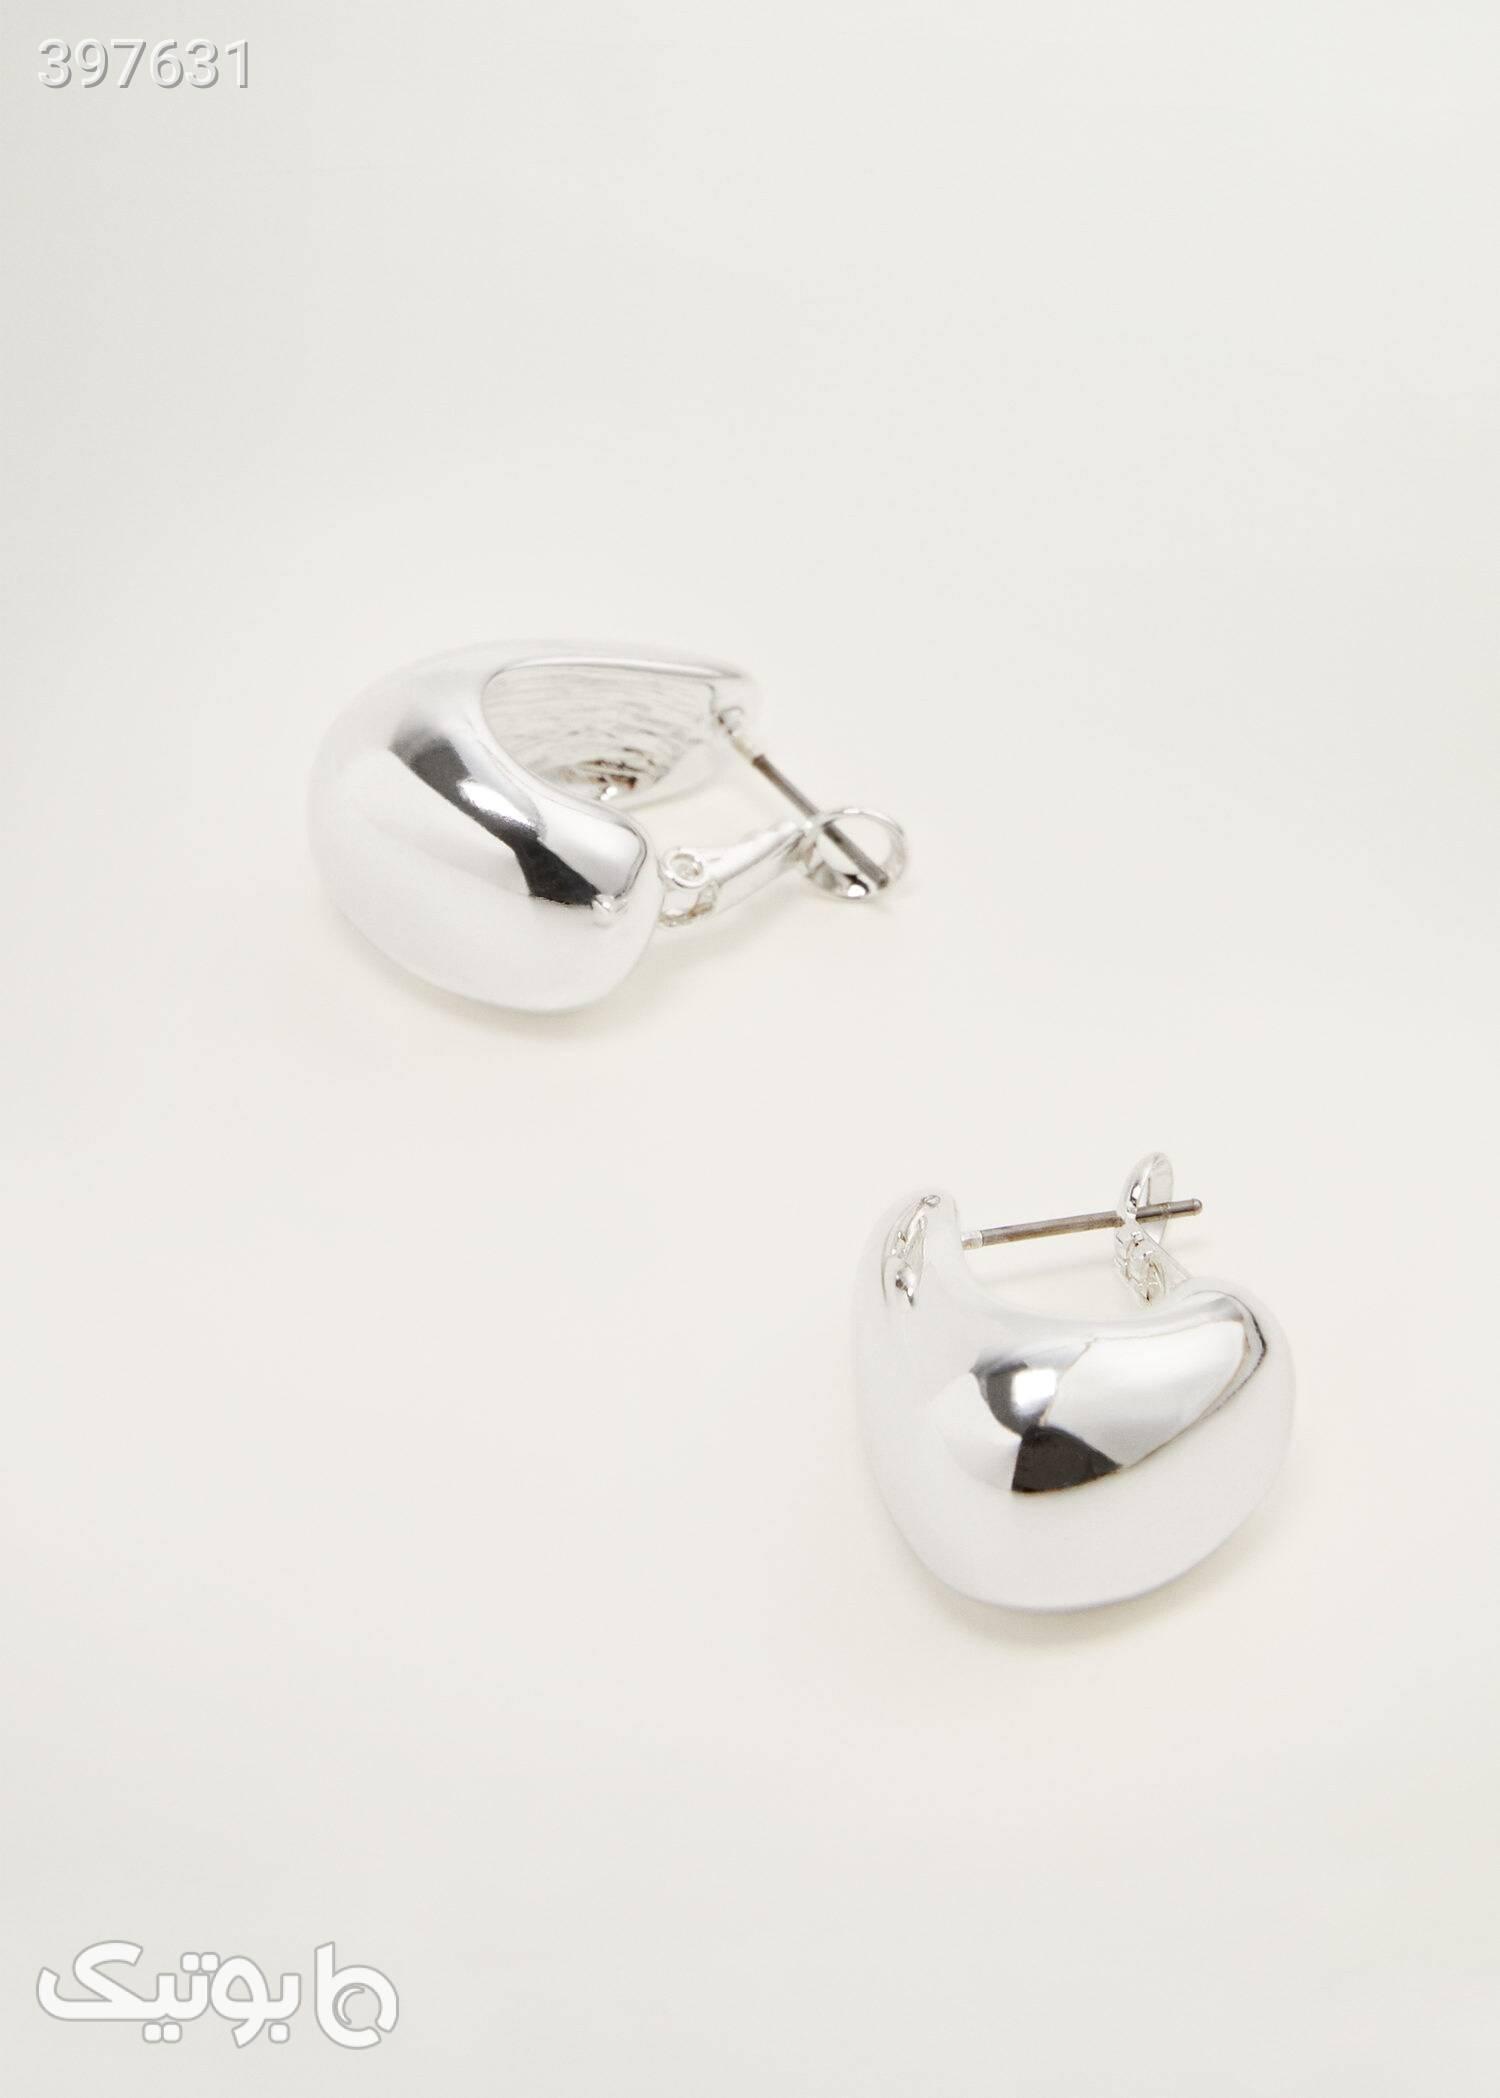 گوشواره حلقهای متالیک زنانه مانگو سفید گوشواره